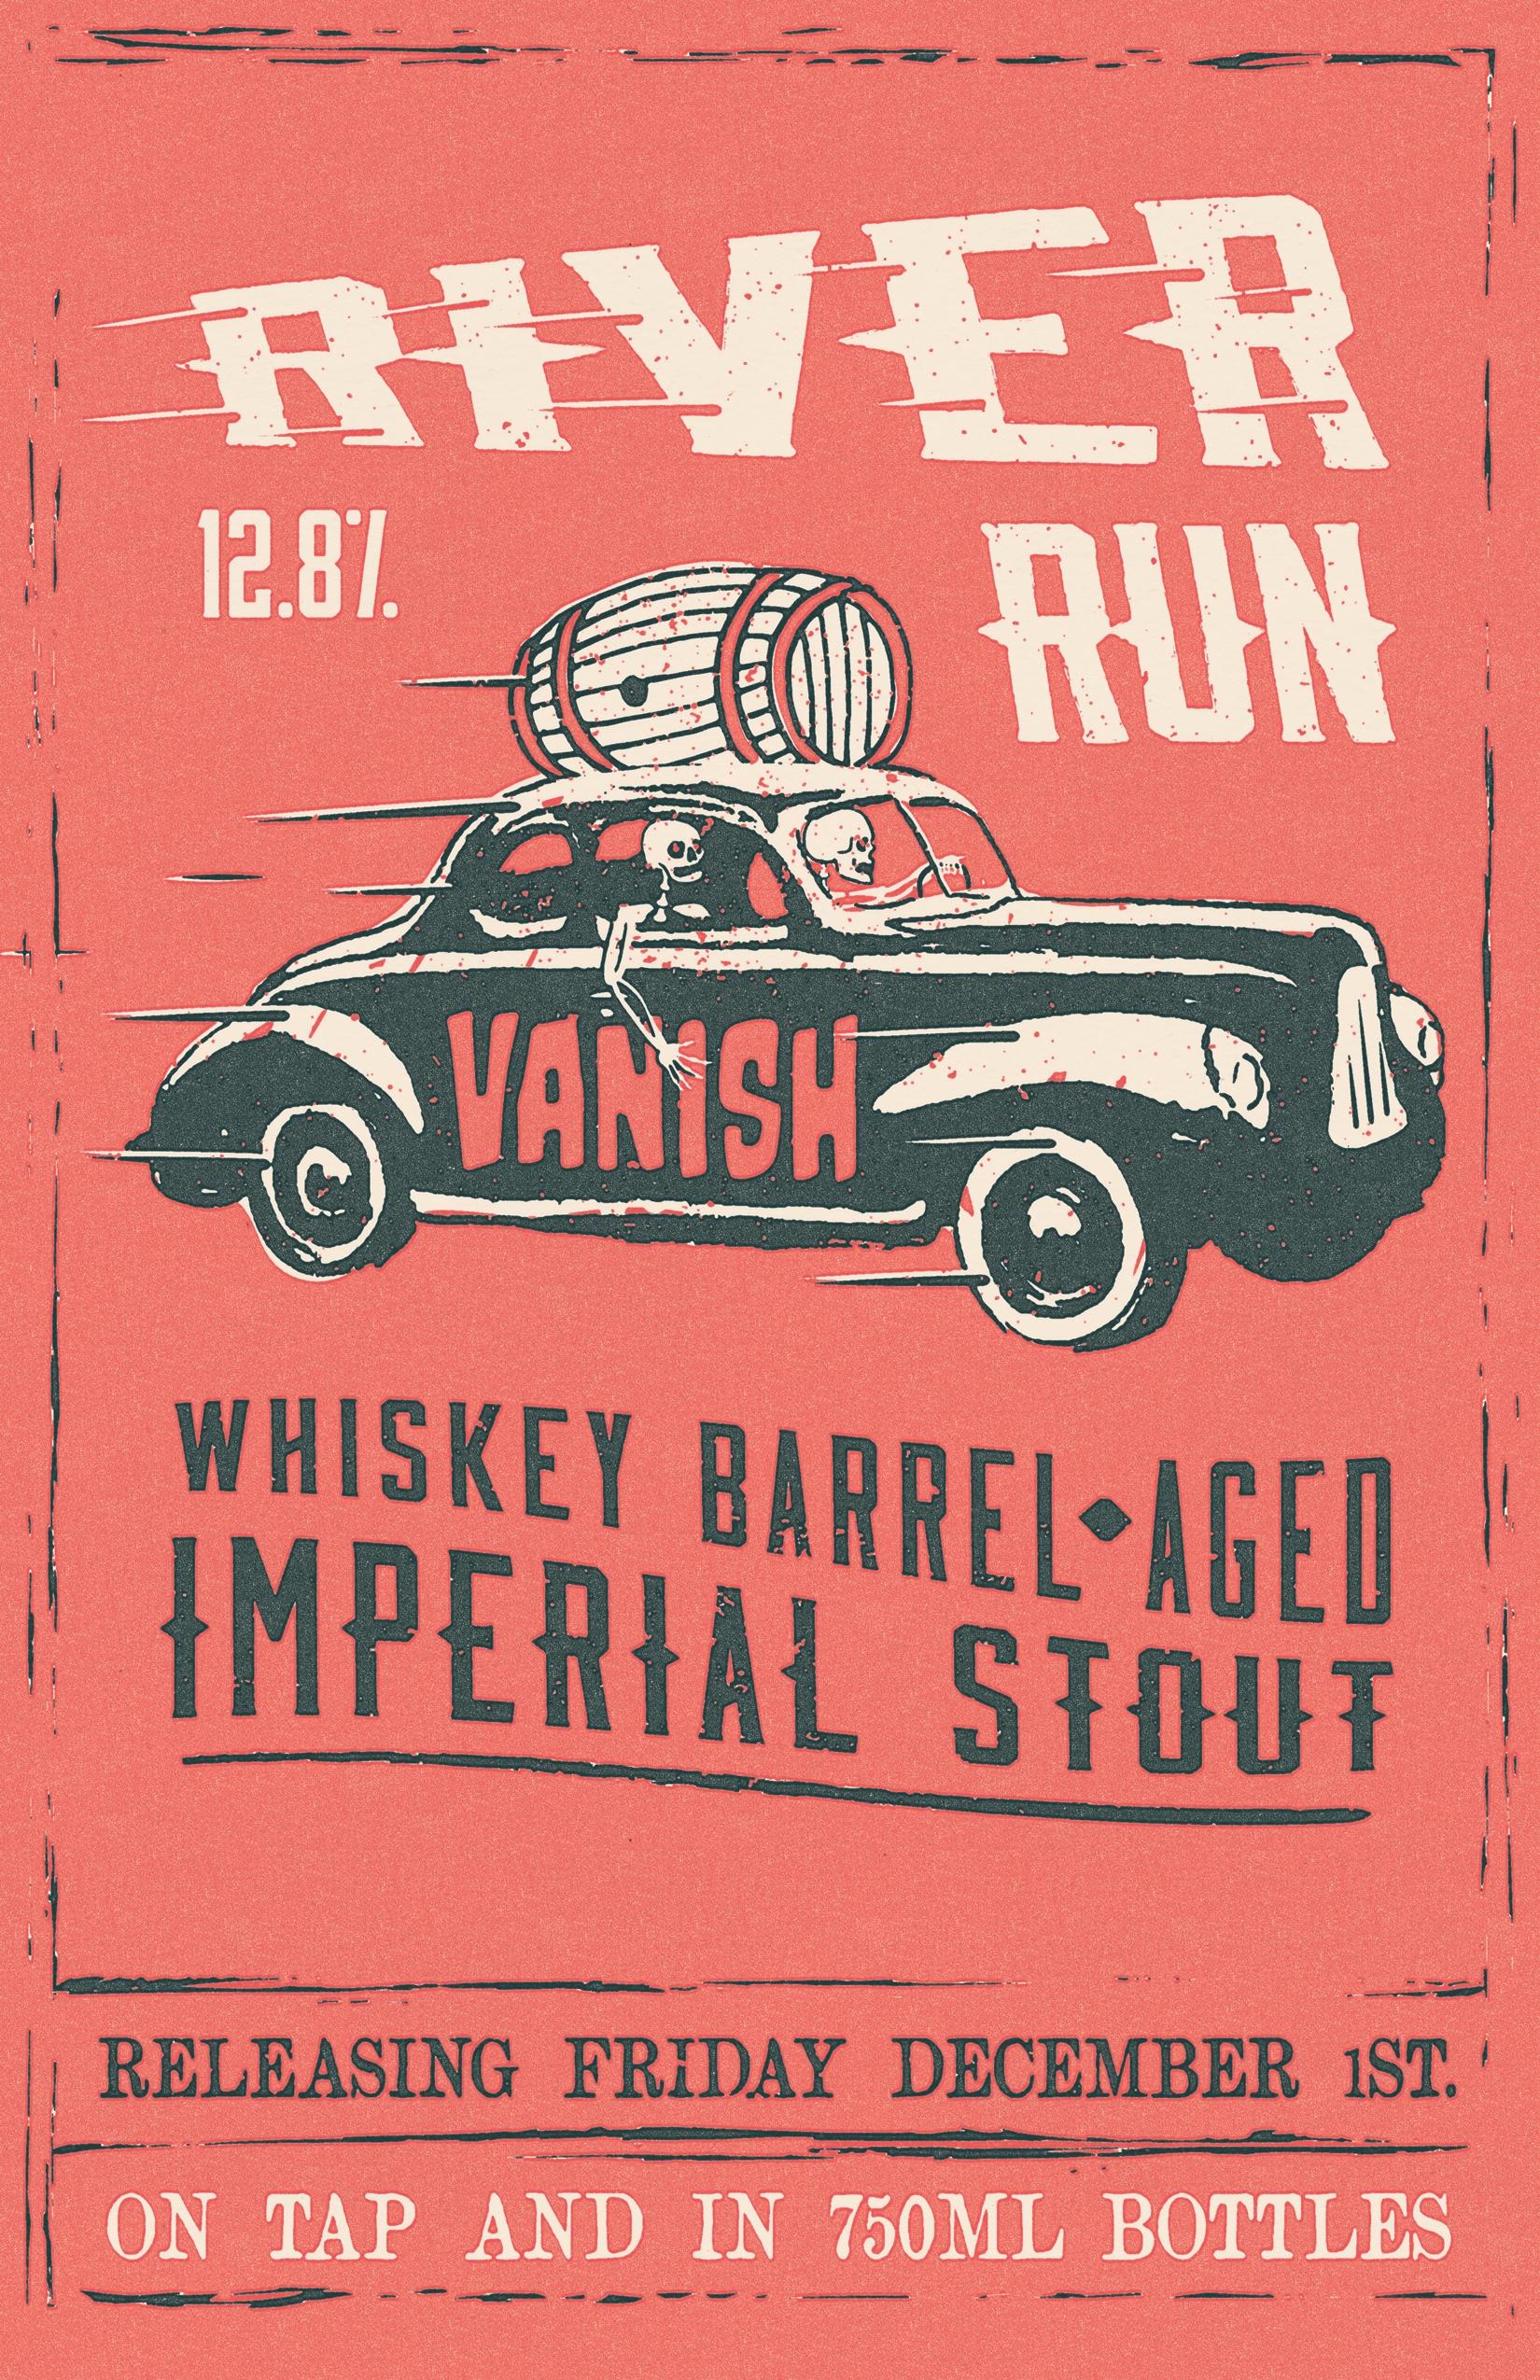 beer release poster - skeleton, illustration - bryanbaltz | ello